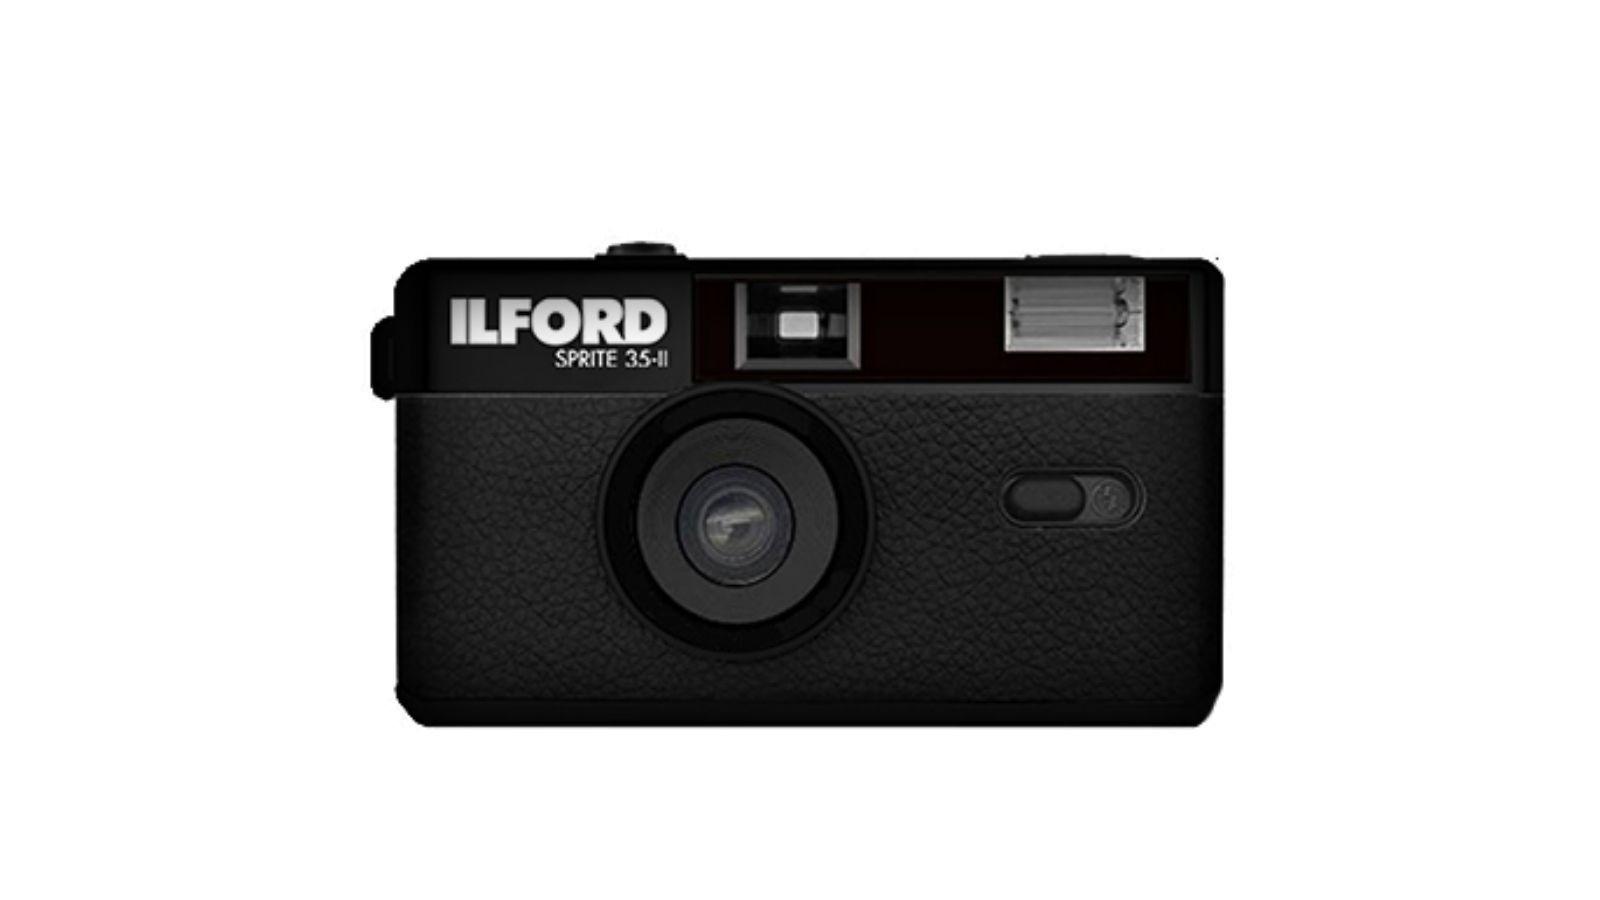 ilford sprite 35-ii precio mexico 2 camara 35 mm negro ok